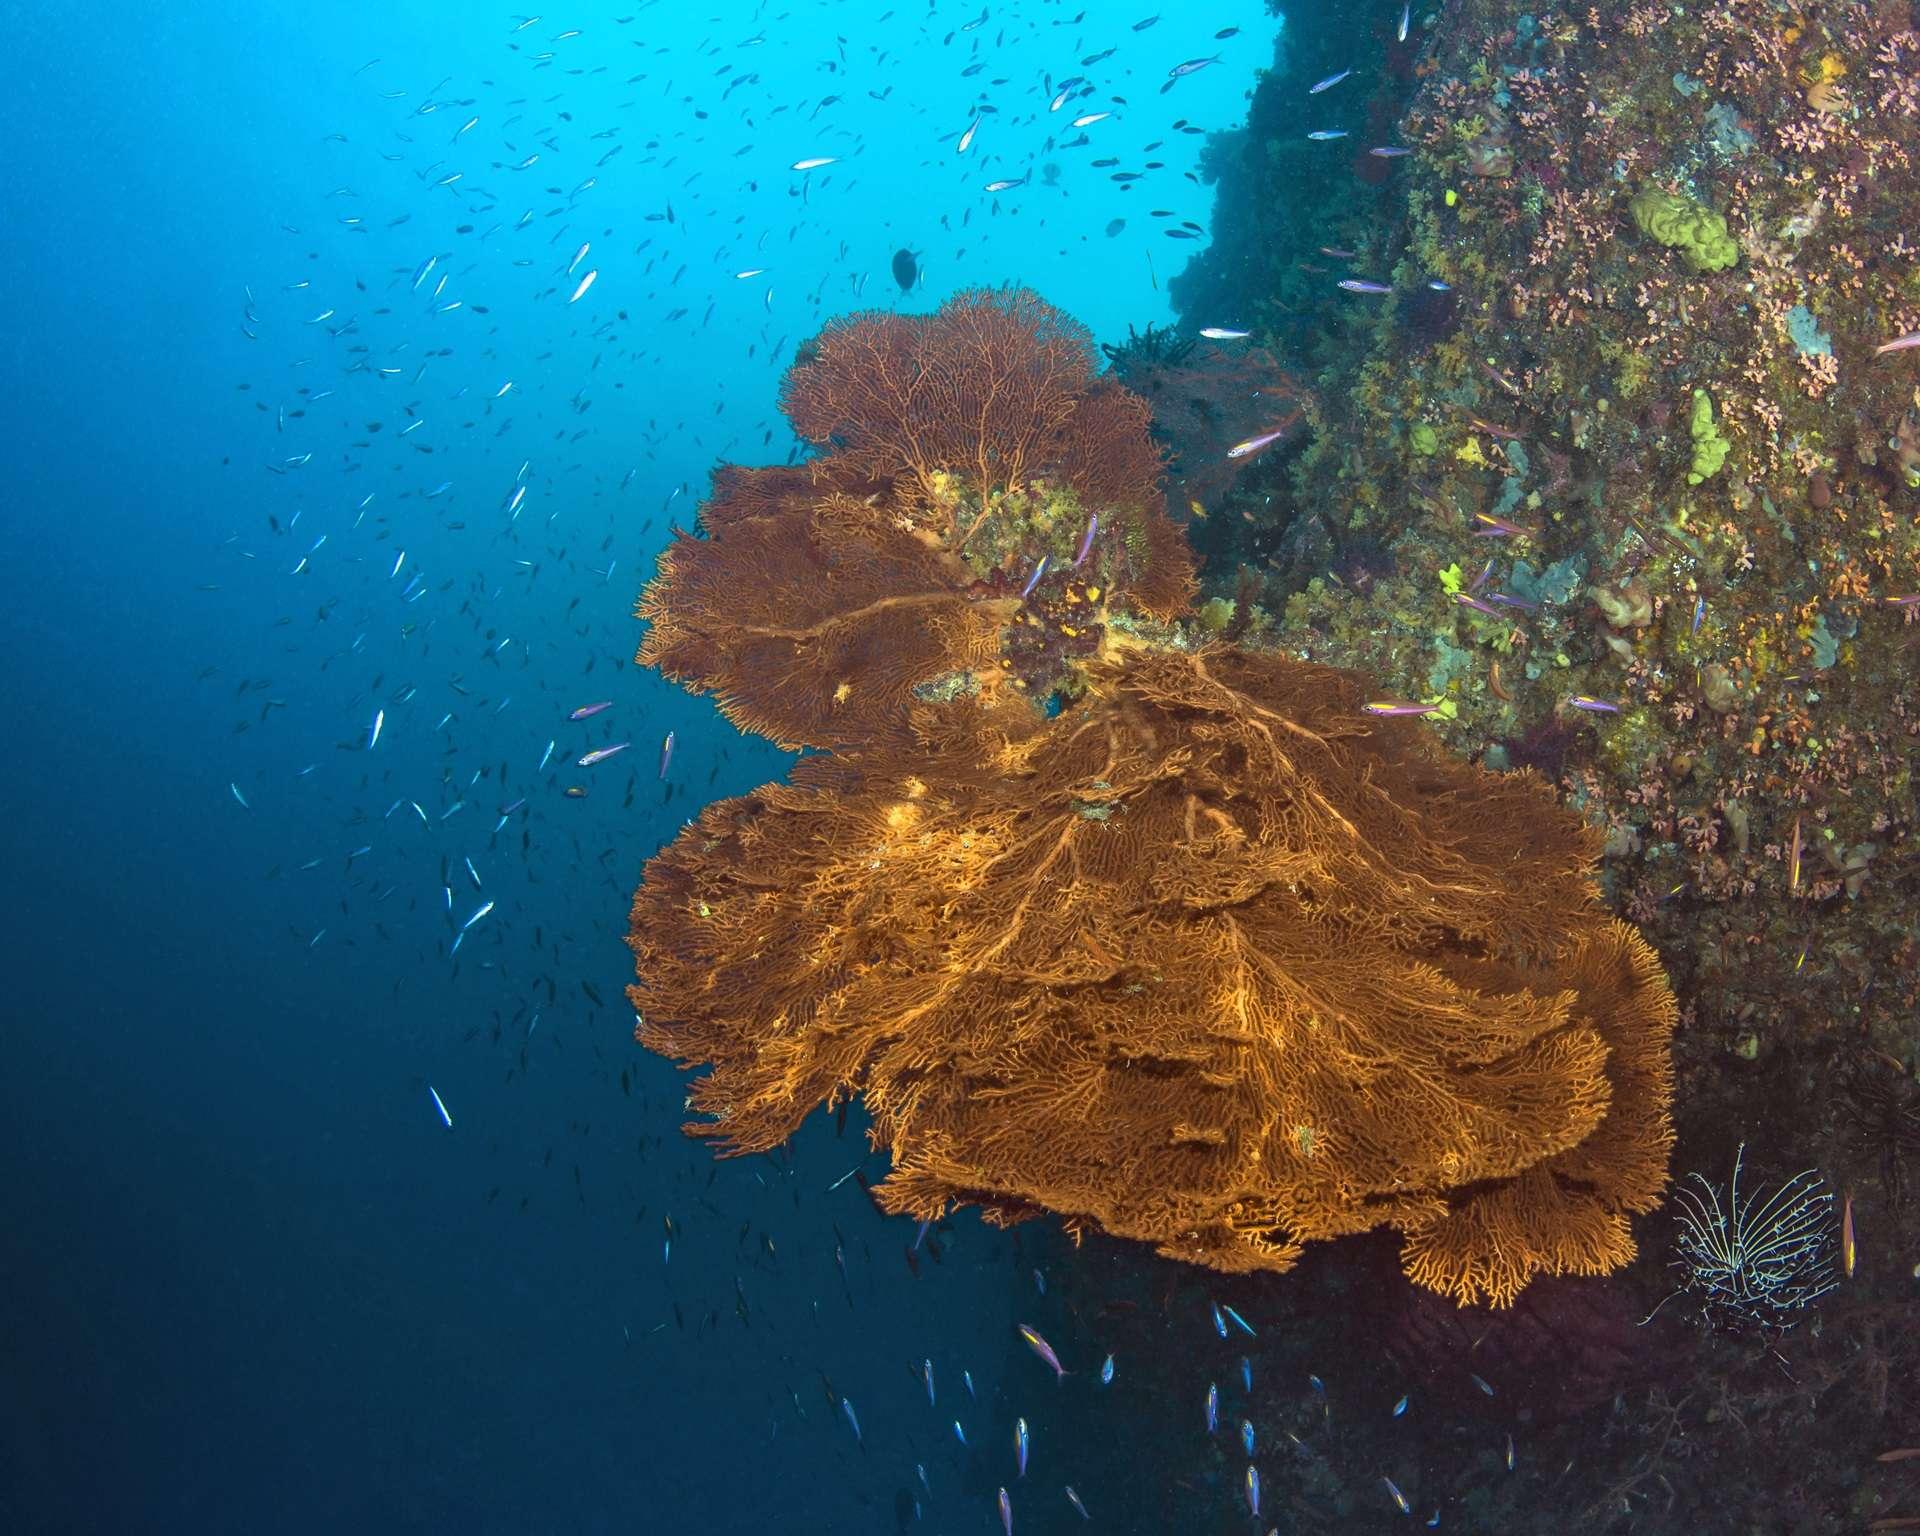 rafa koralowa chiny divers24.pl